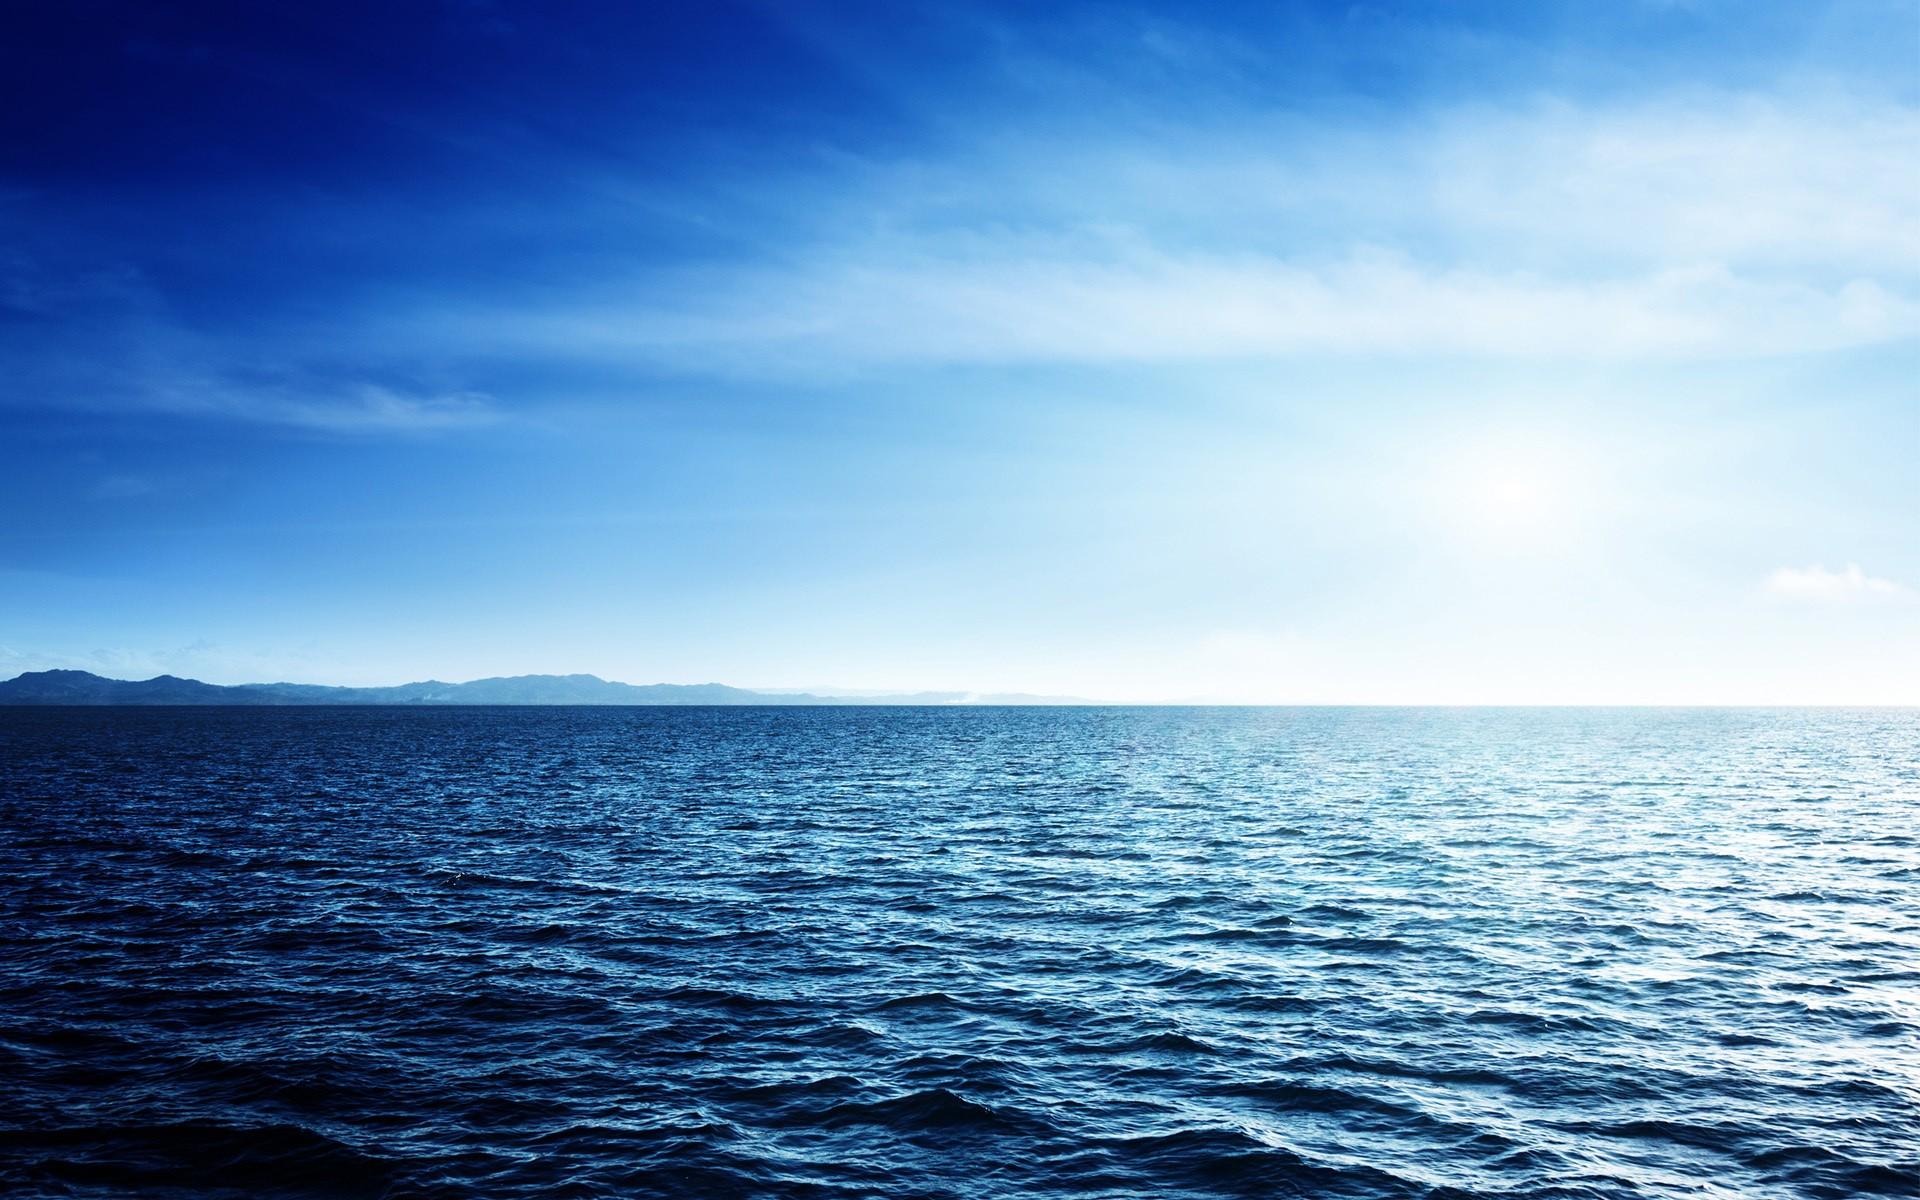 46 Blue Ocean Wallpapers On Wallpapersafari